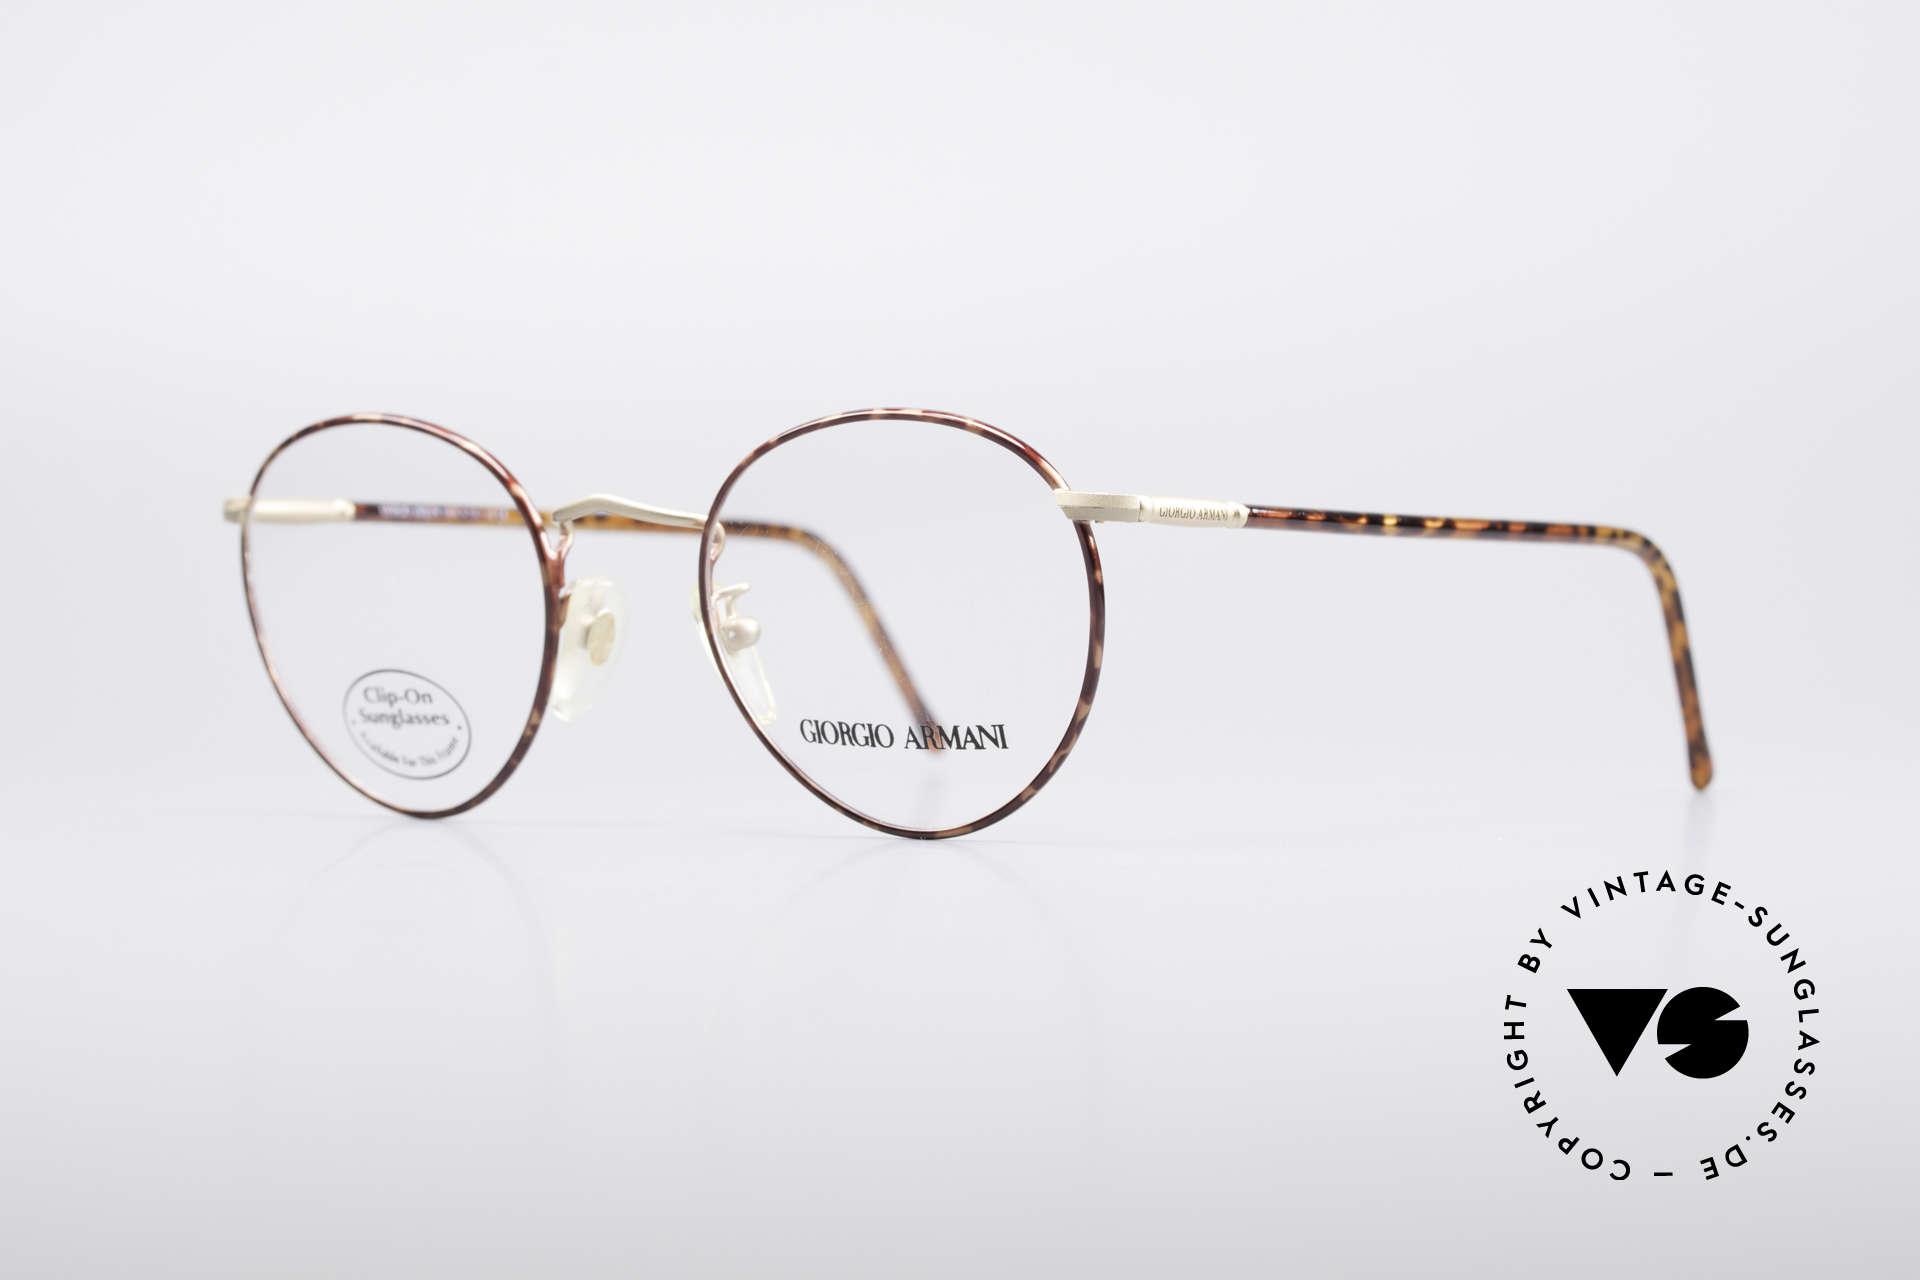 Giorgio Armani 186 Classic 90's Panto Frame, true 'gentlemen glasses' in tangible premium-quality, Made for Men